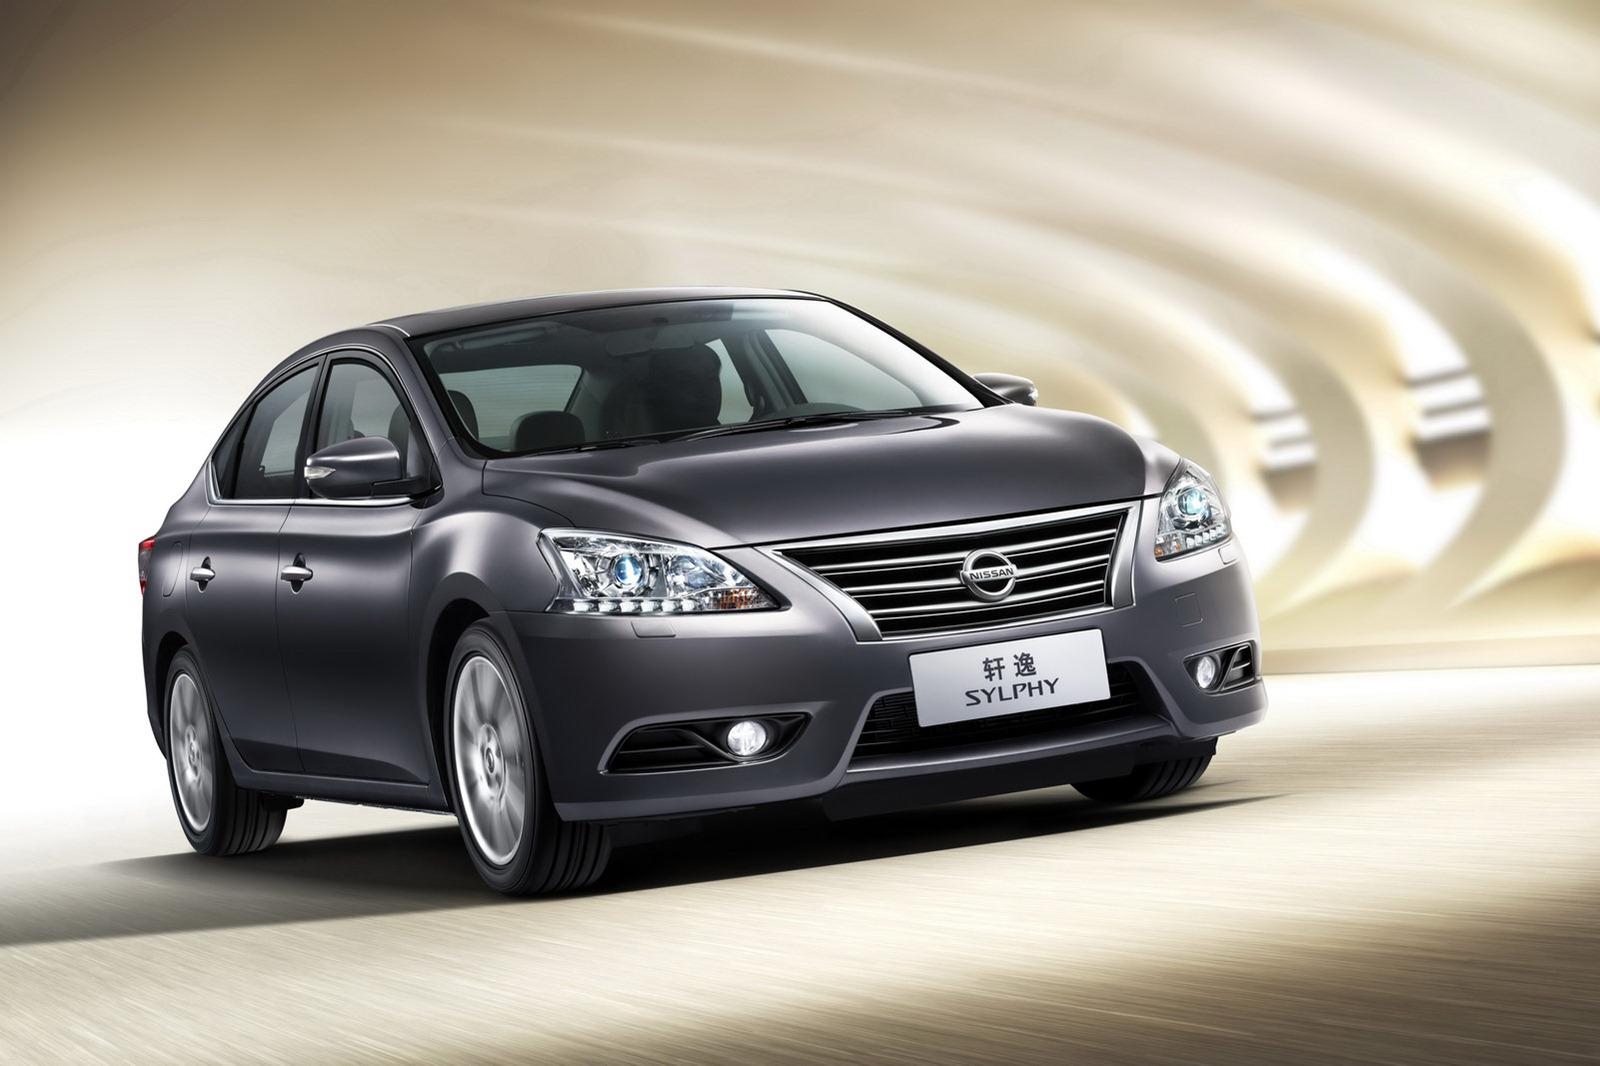 2013 Nissan Sentra | Auto Cars Concept